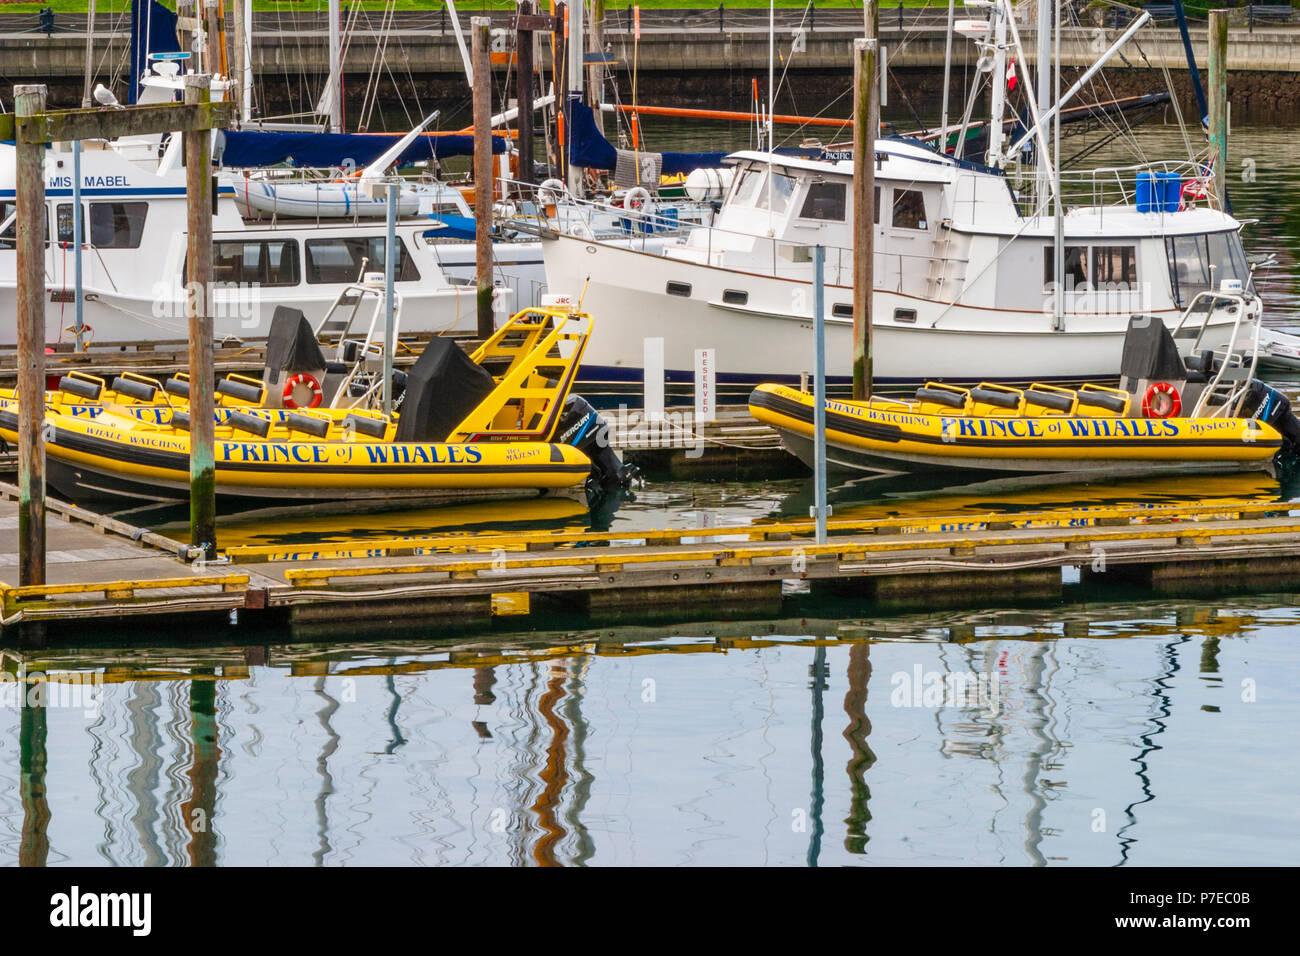 Tour boats at Victoria Harbour in Victoria, British Columbia, Canada. - Stock Image